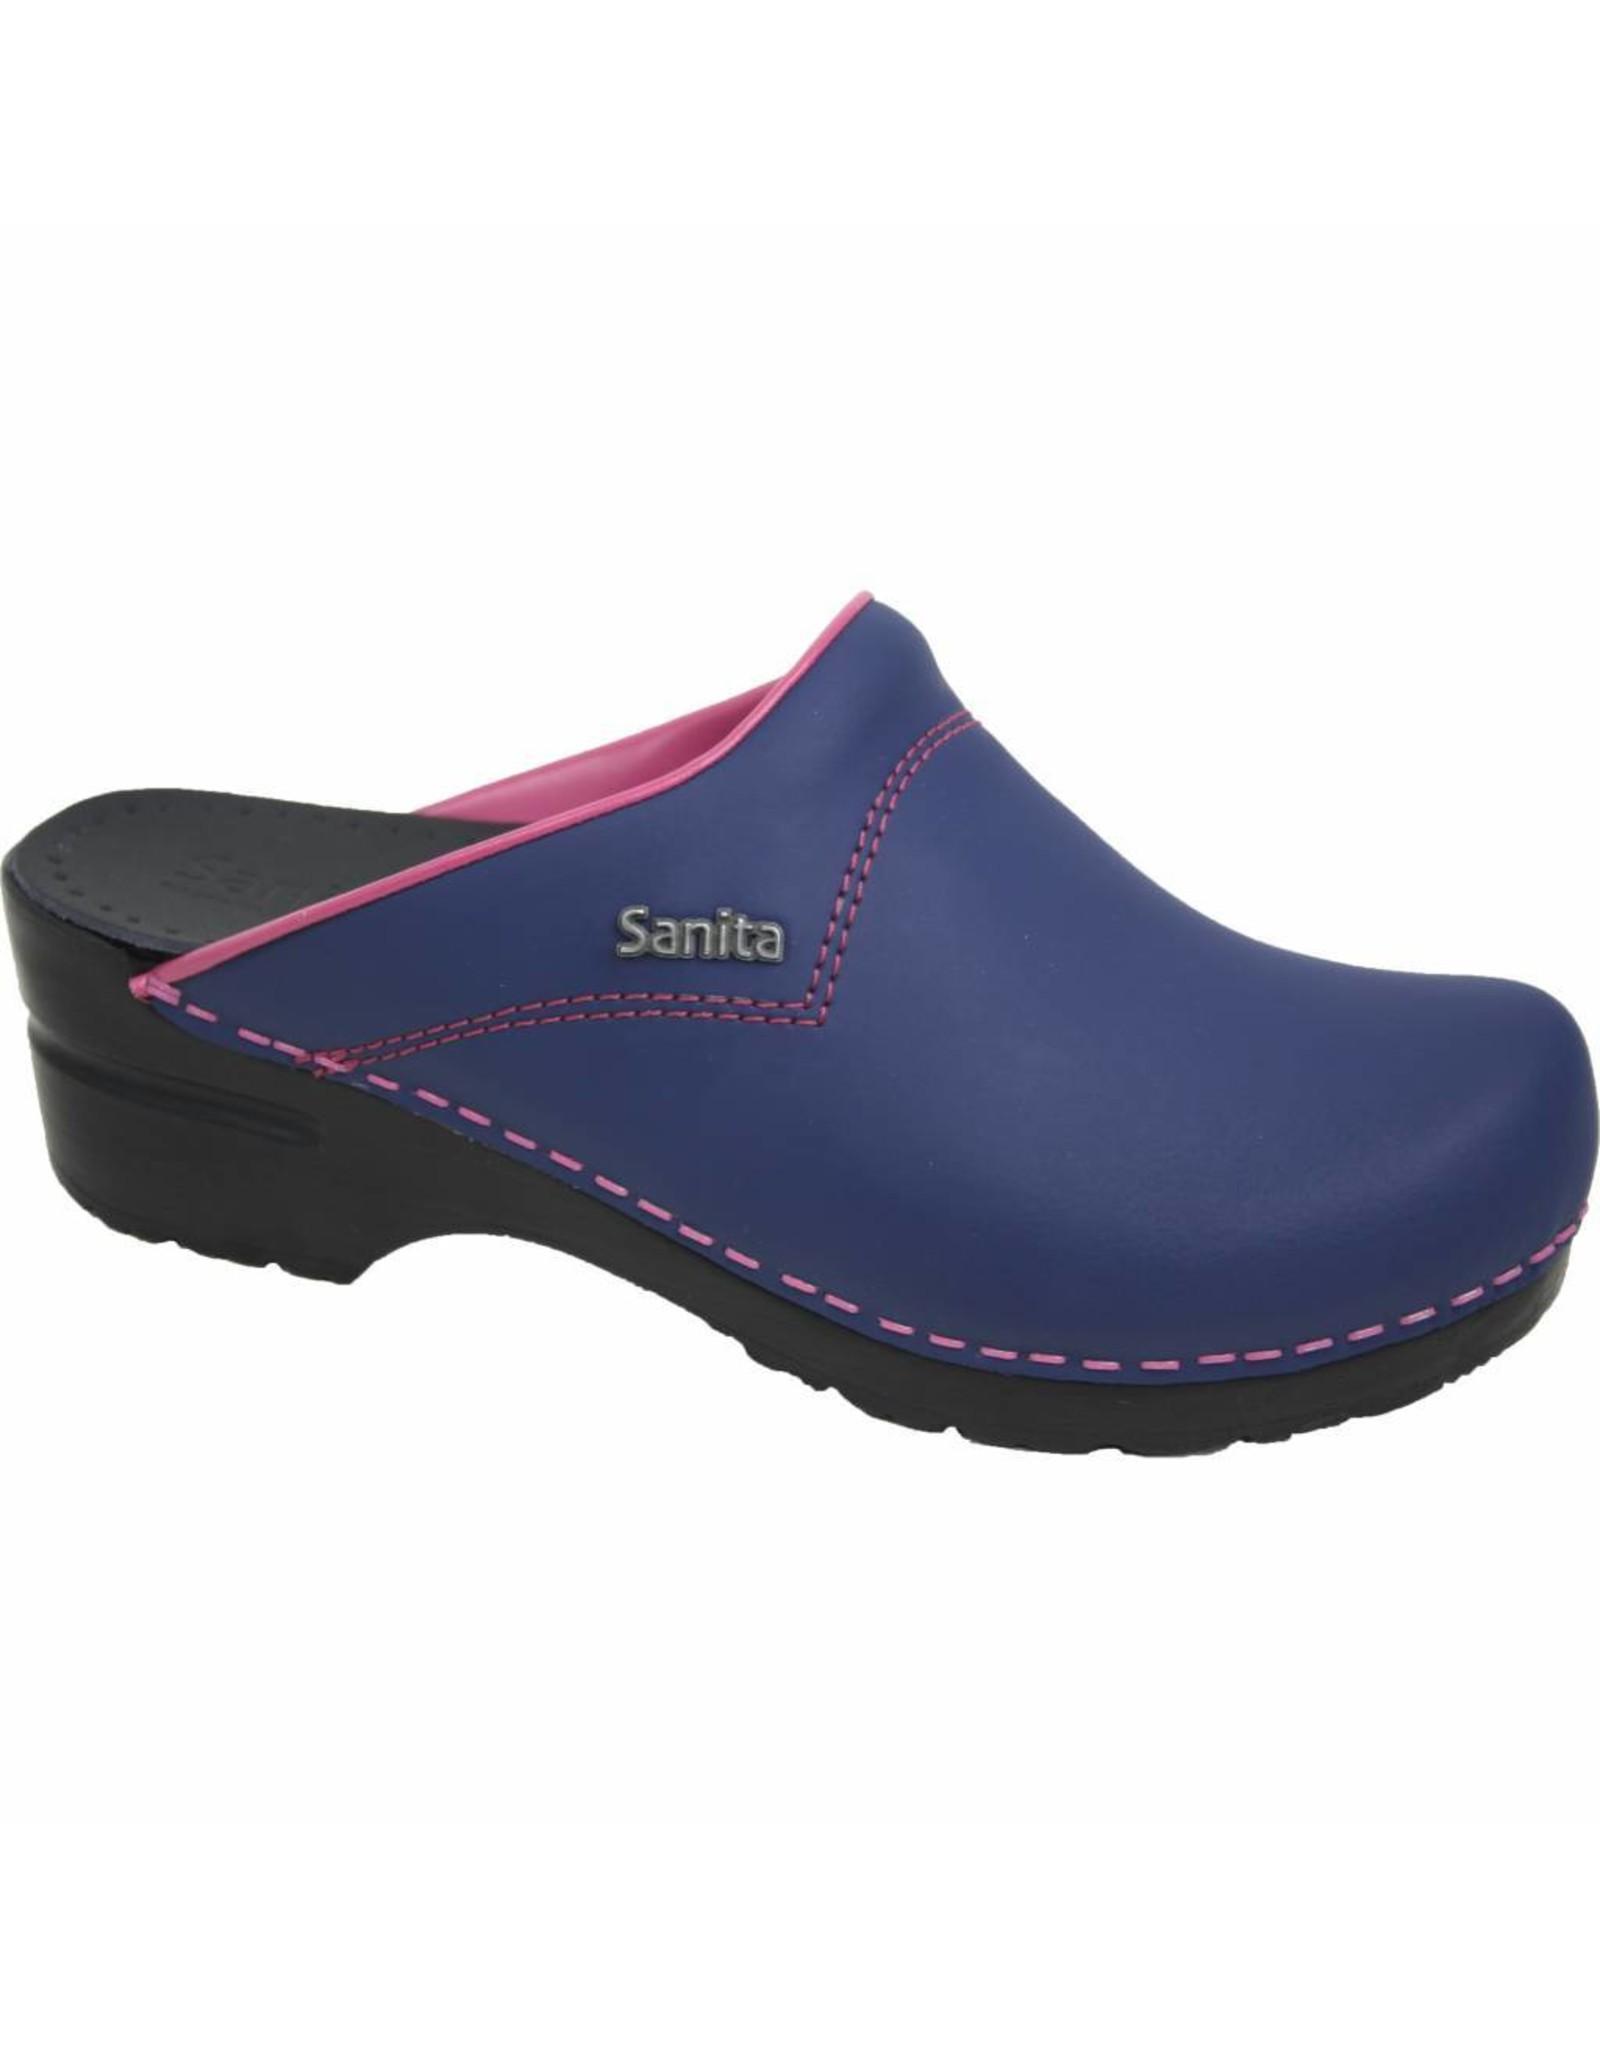 Sanita® Sanita Flex klompen, 314, Jeansblauw roze accent, open